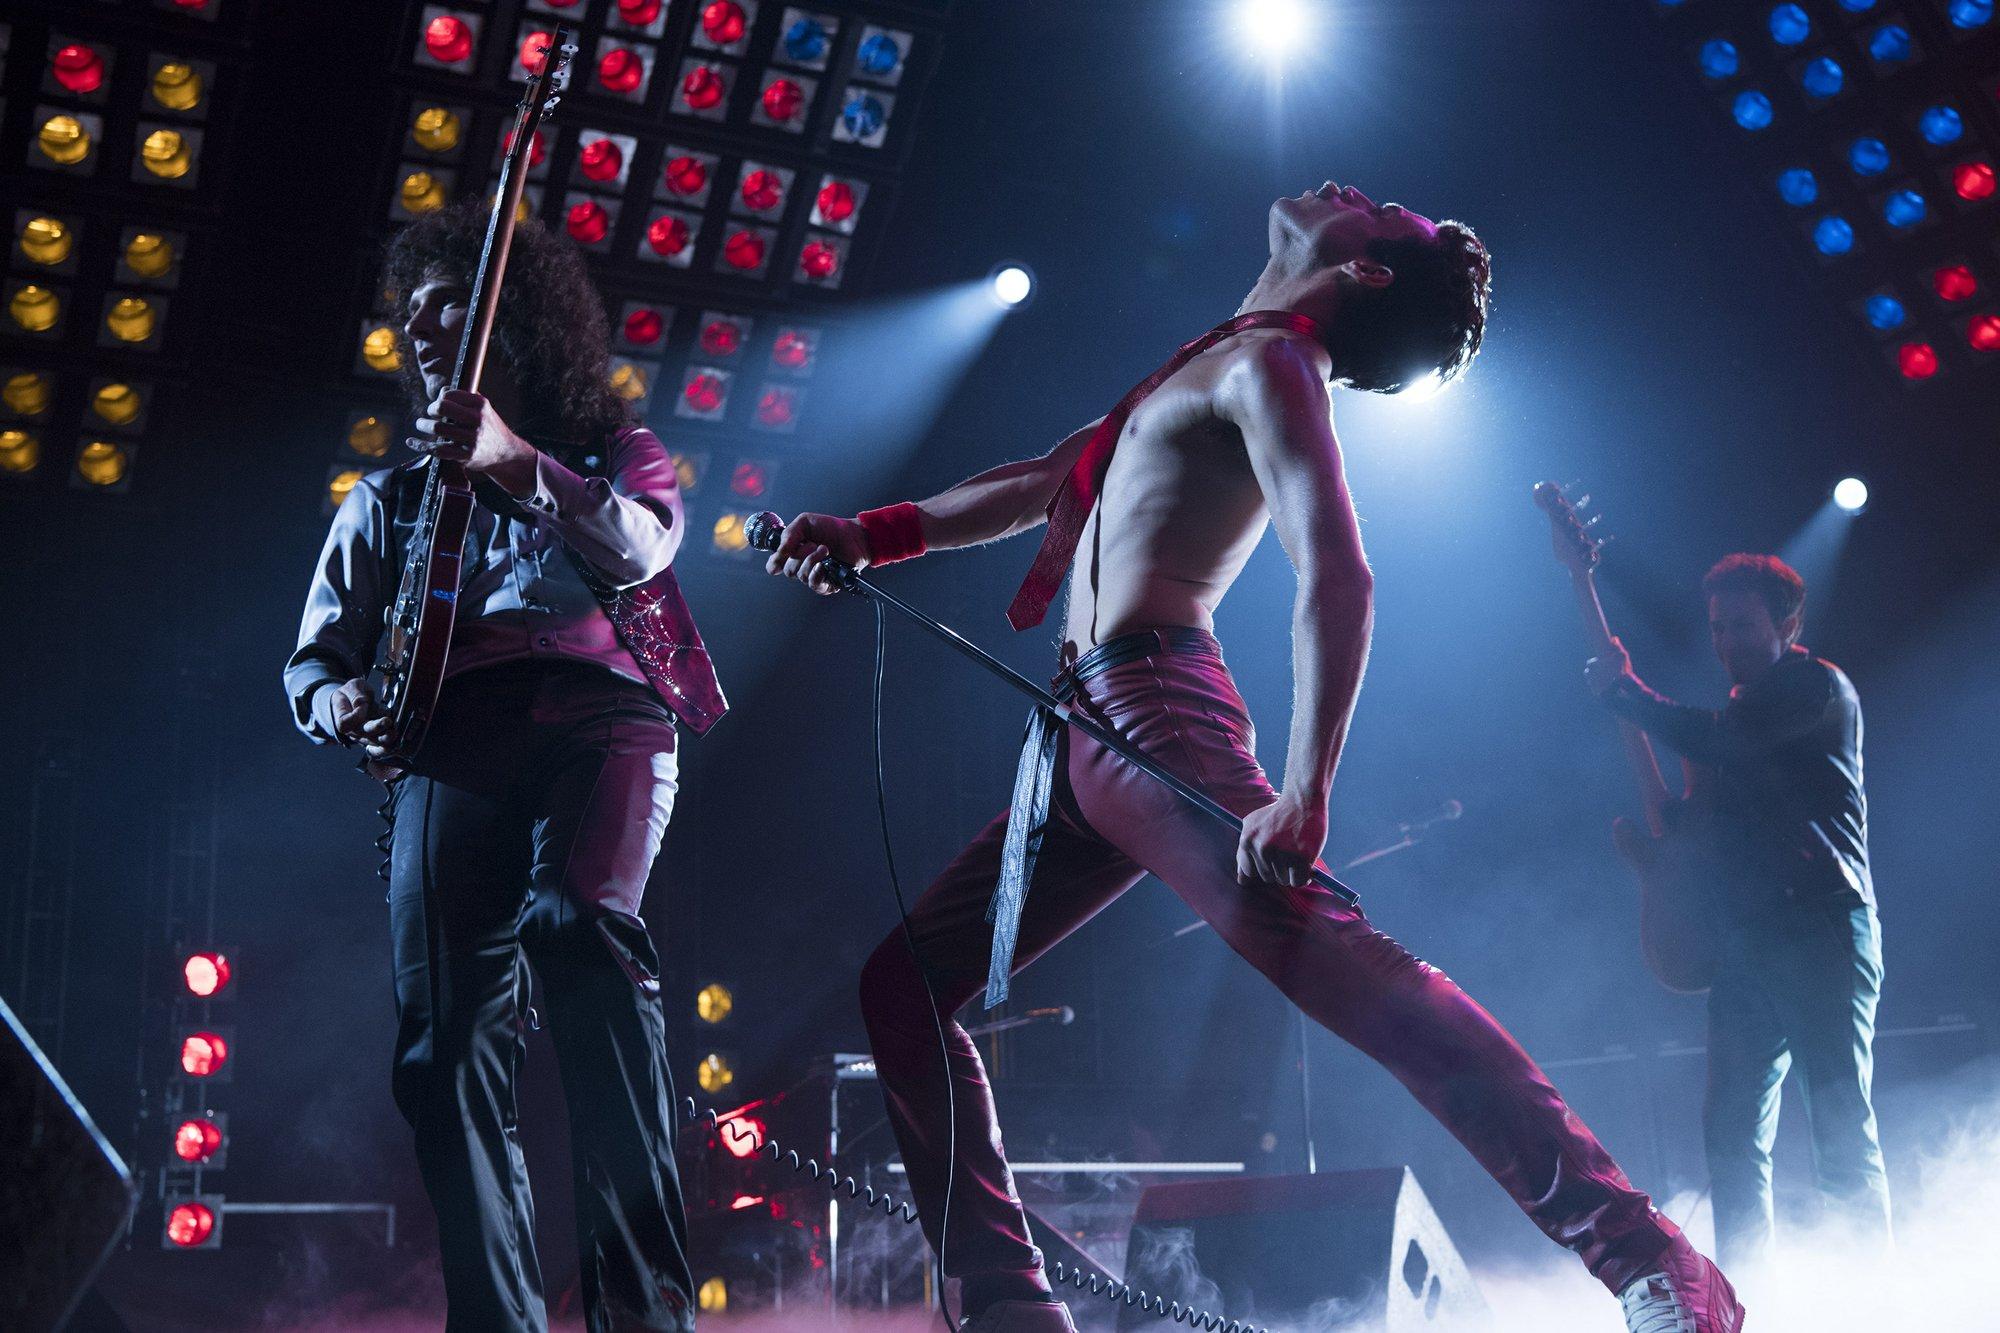 With $50 million debut, 'Bohemian Rhapsody' is no poor boy